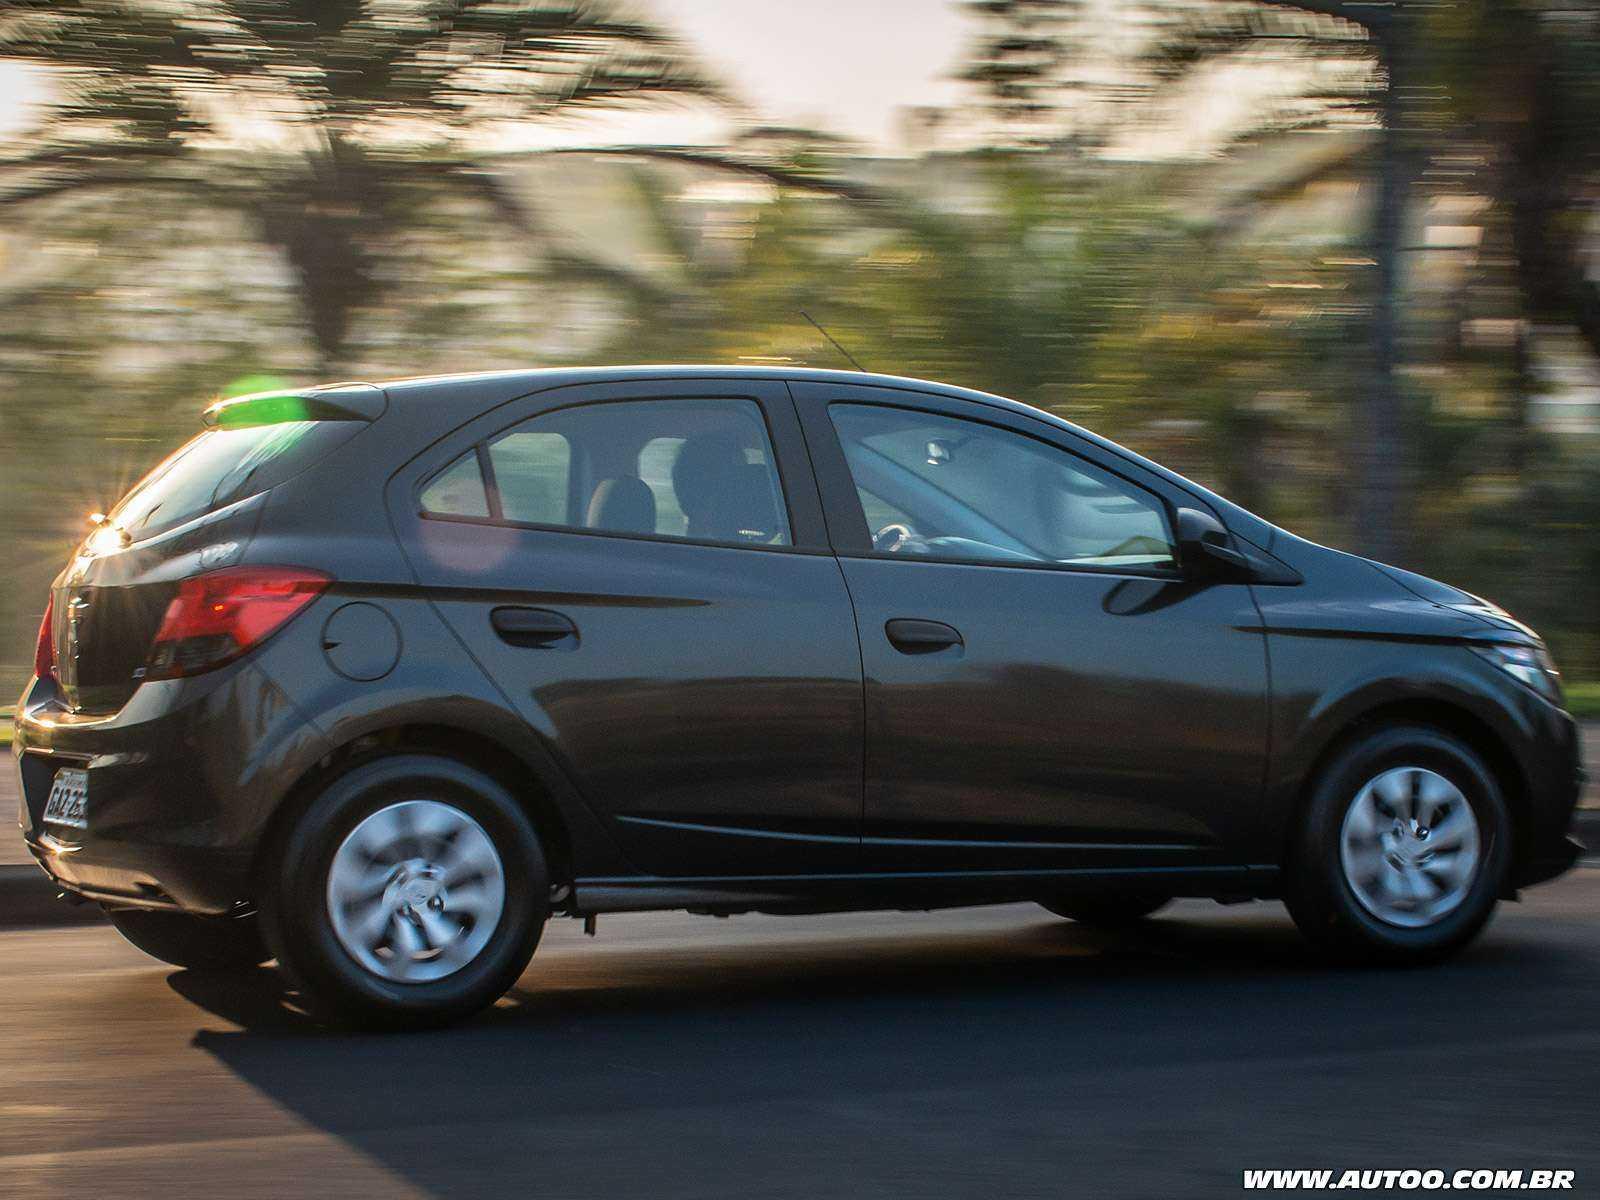 ChevroletOnix 2019 - lateral